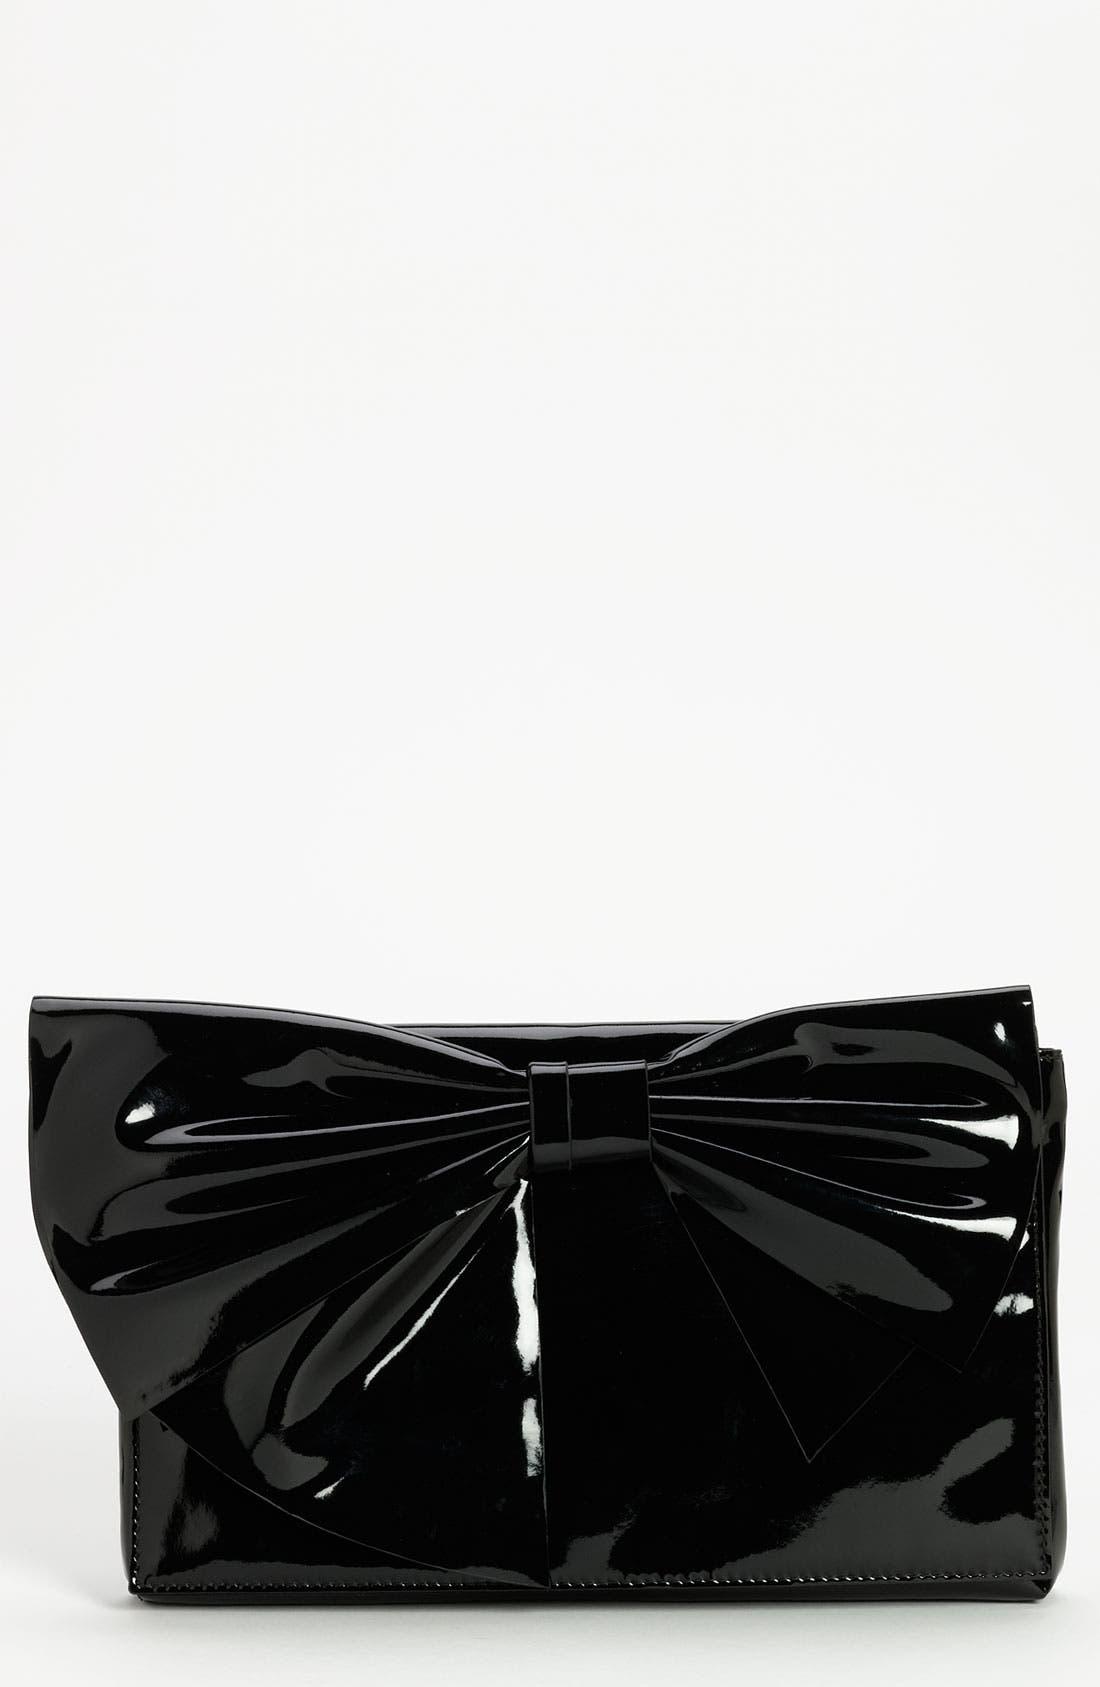 Main Image - Valentino 'Lacca Bow' Clutch